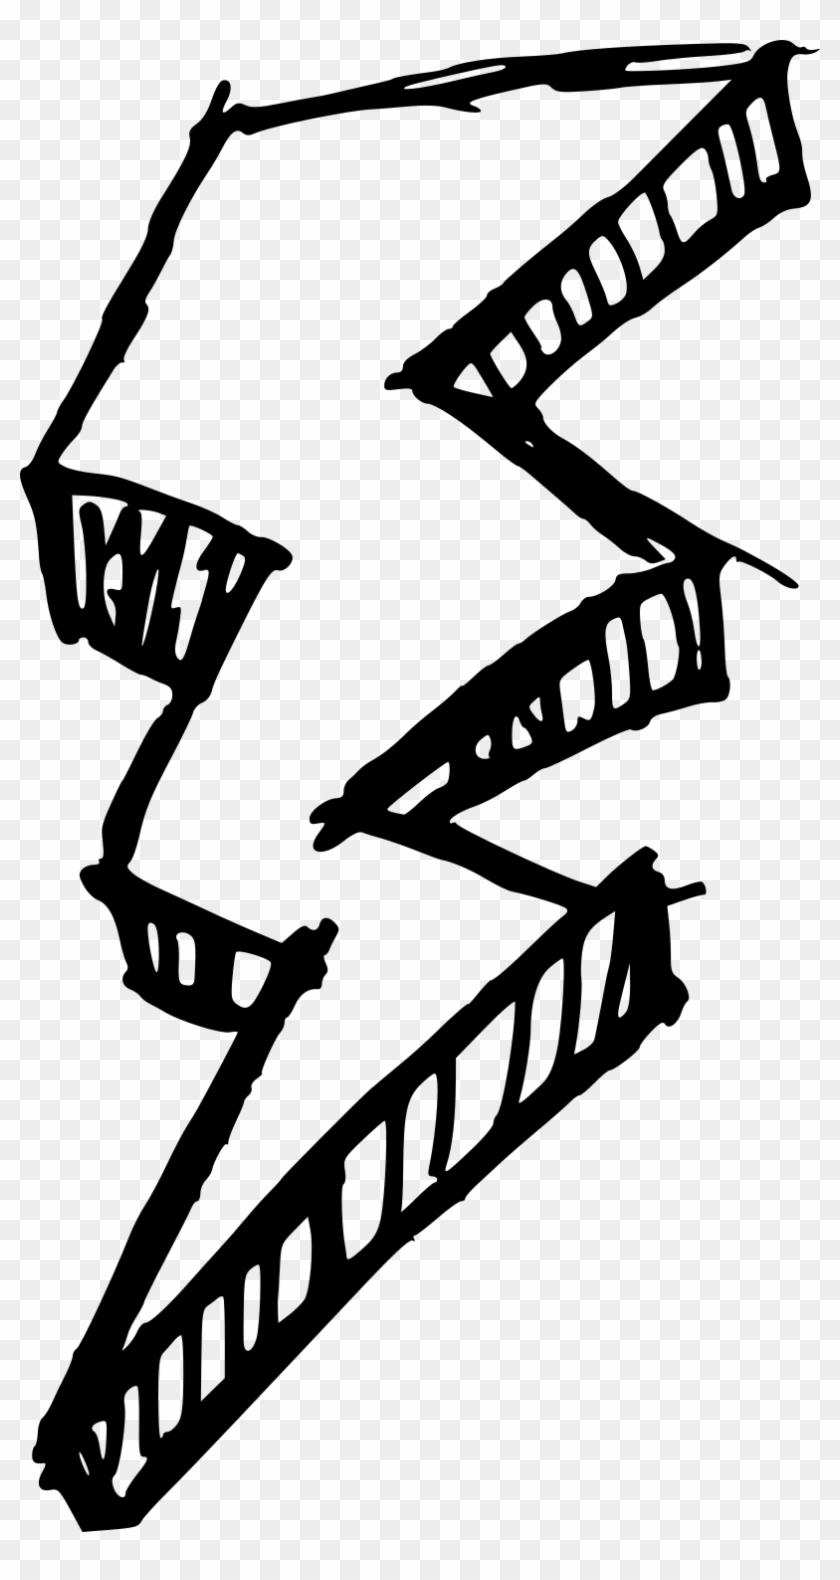 Lightning Bolt Silhouette - Drawing Lightning Bolt Png #64802